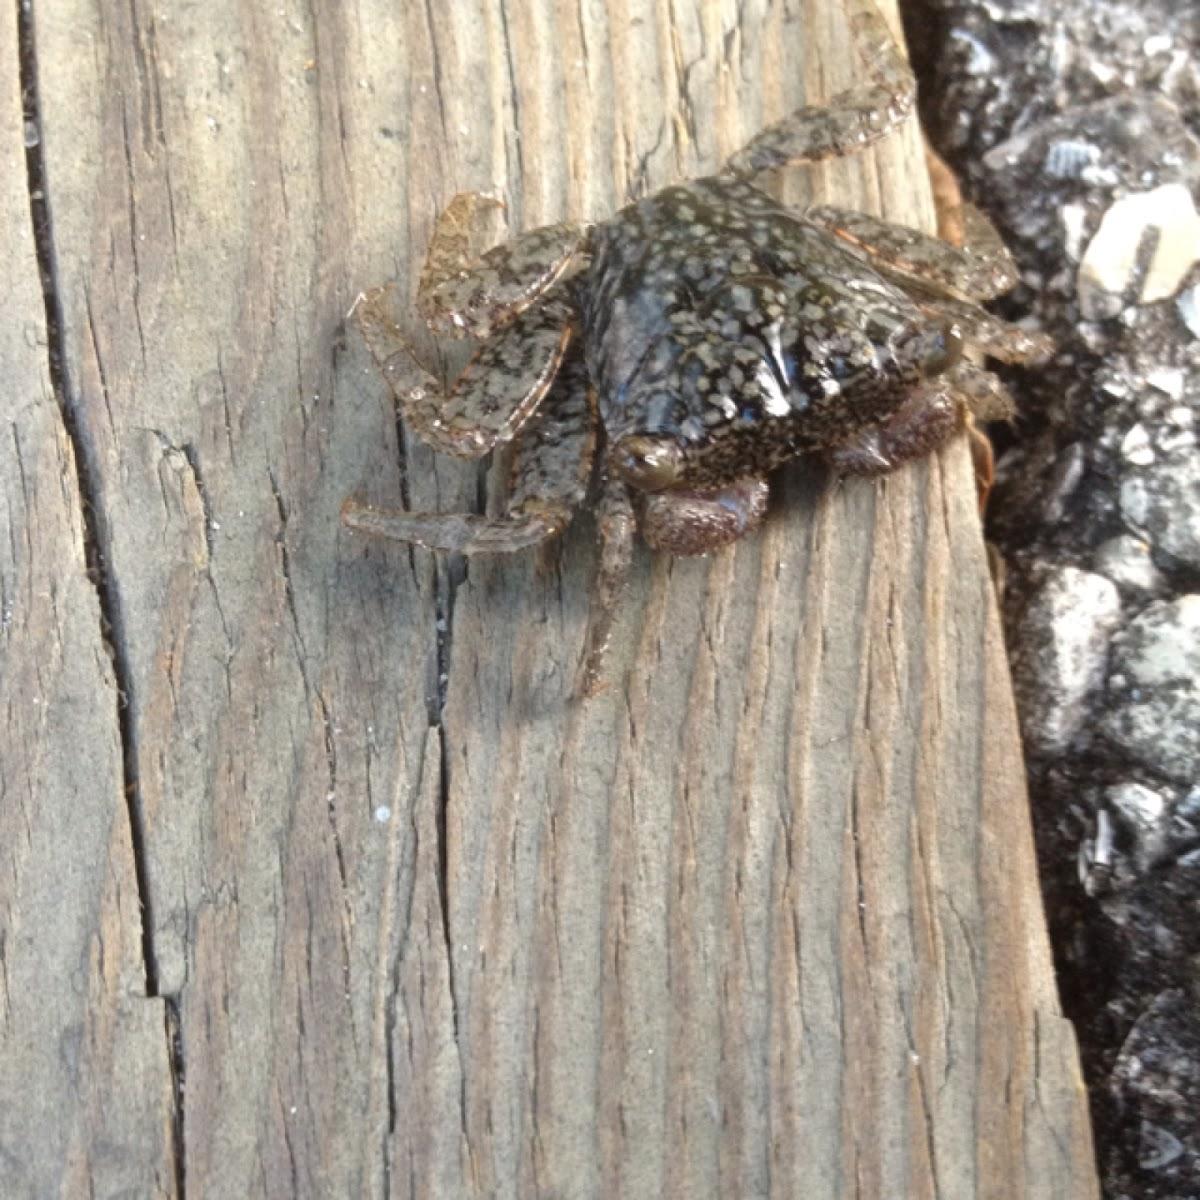 Mangrove tree crab